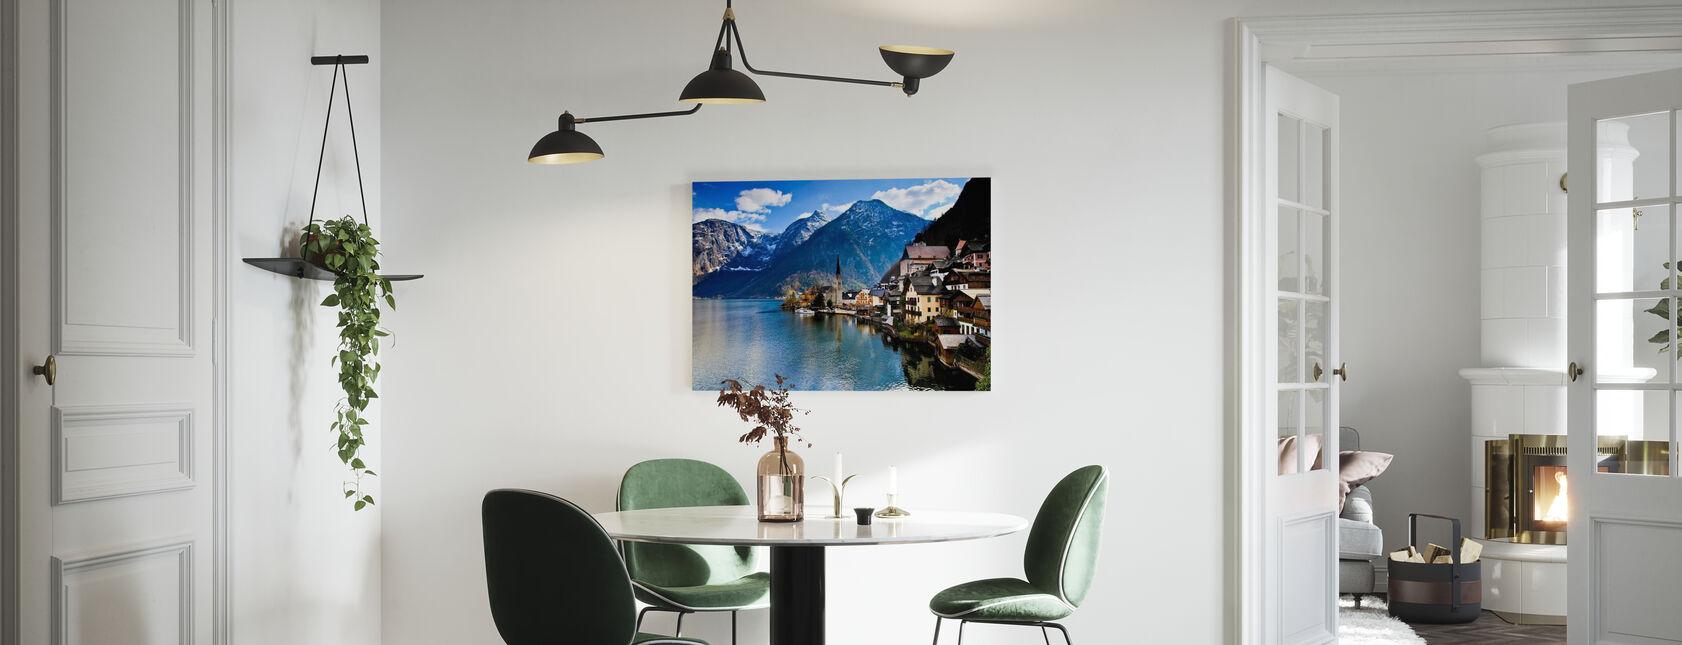 Small Austrian Mountain Village - Canvas print - Kitchen